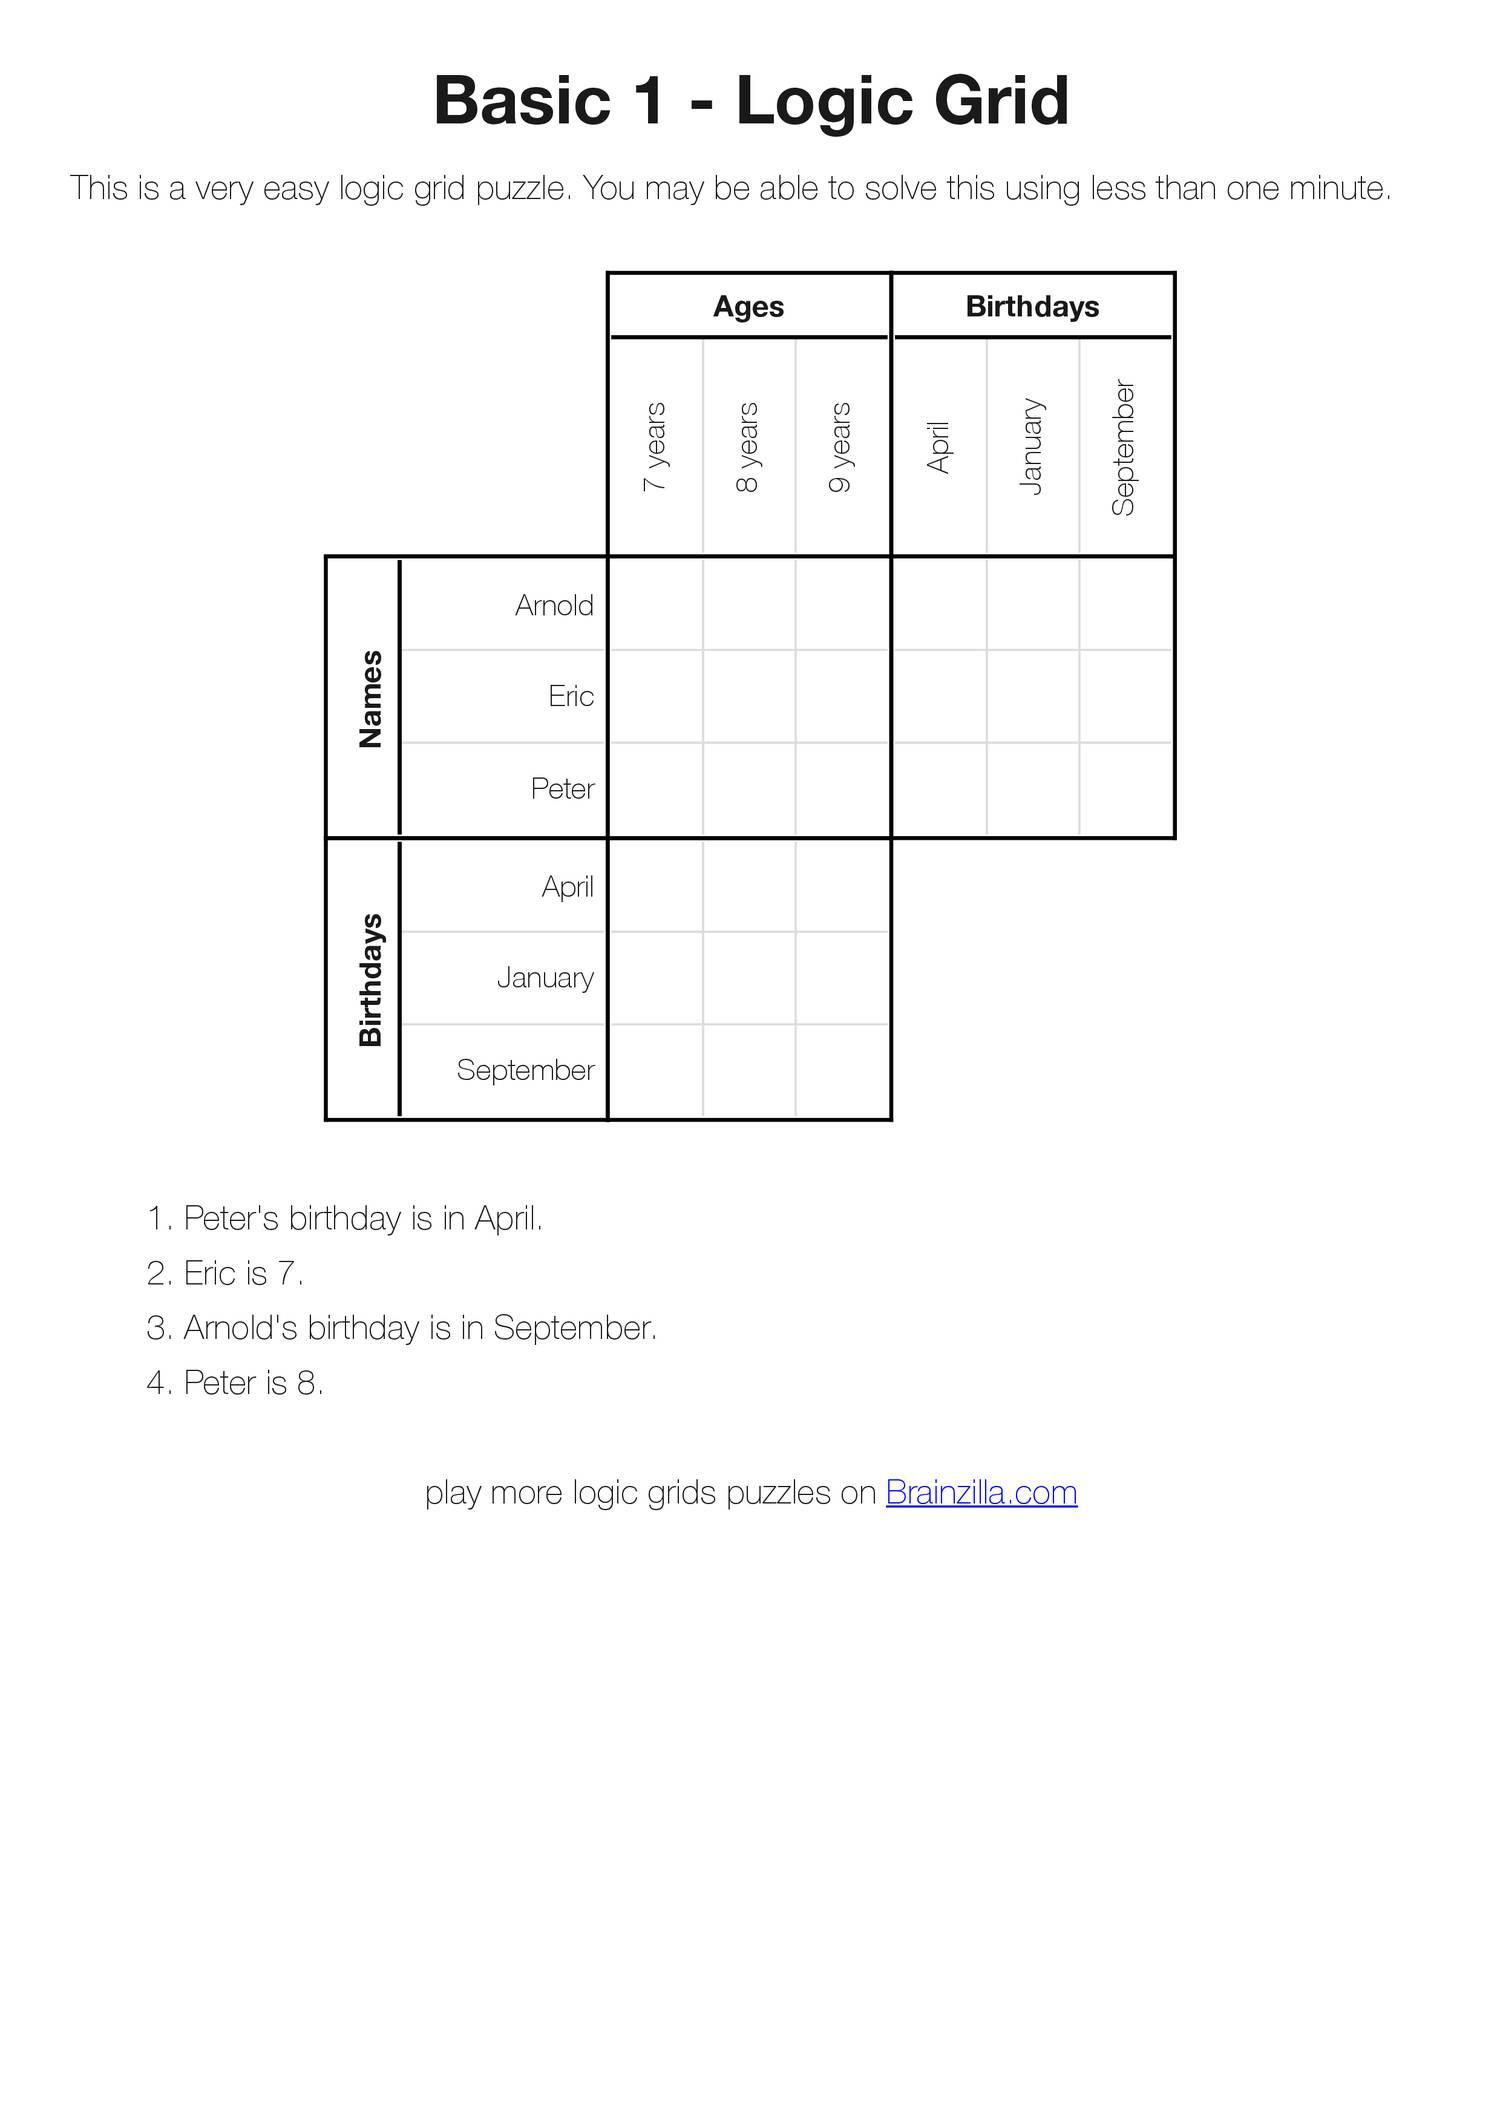 Printable Logic Grid Puzzles (Brainzilla).pdf   Docdroid - Printable Deduction Puzzles